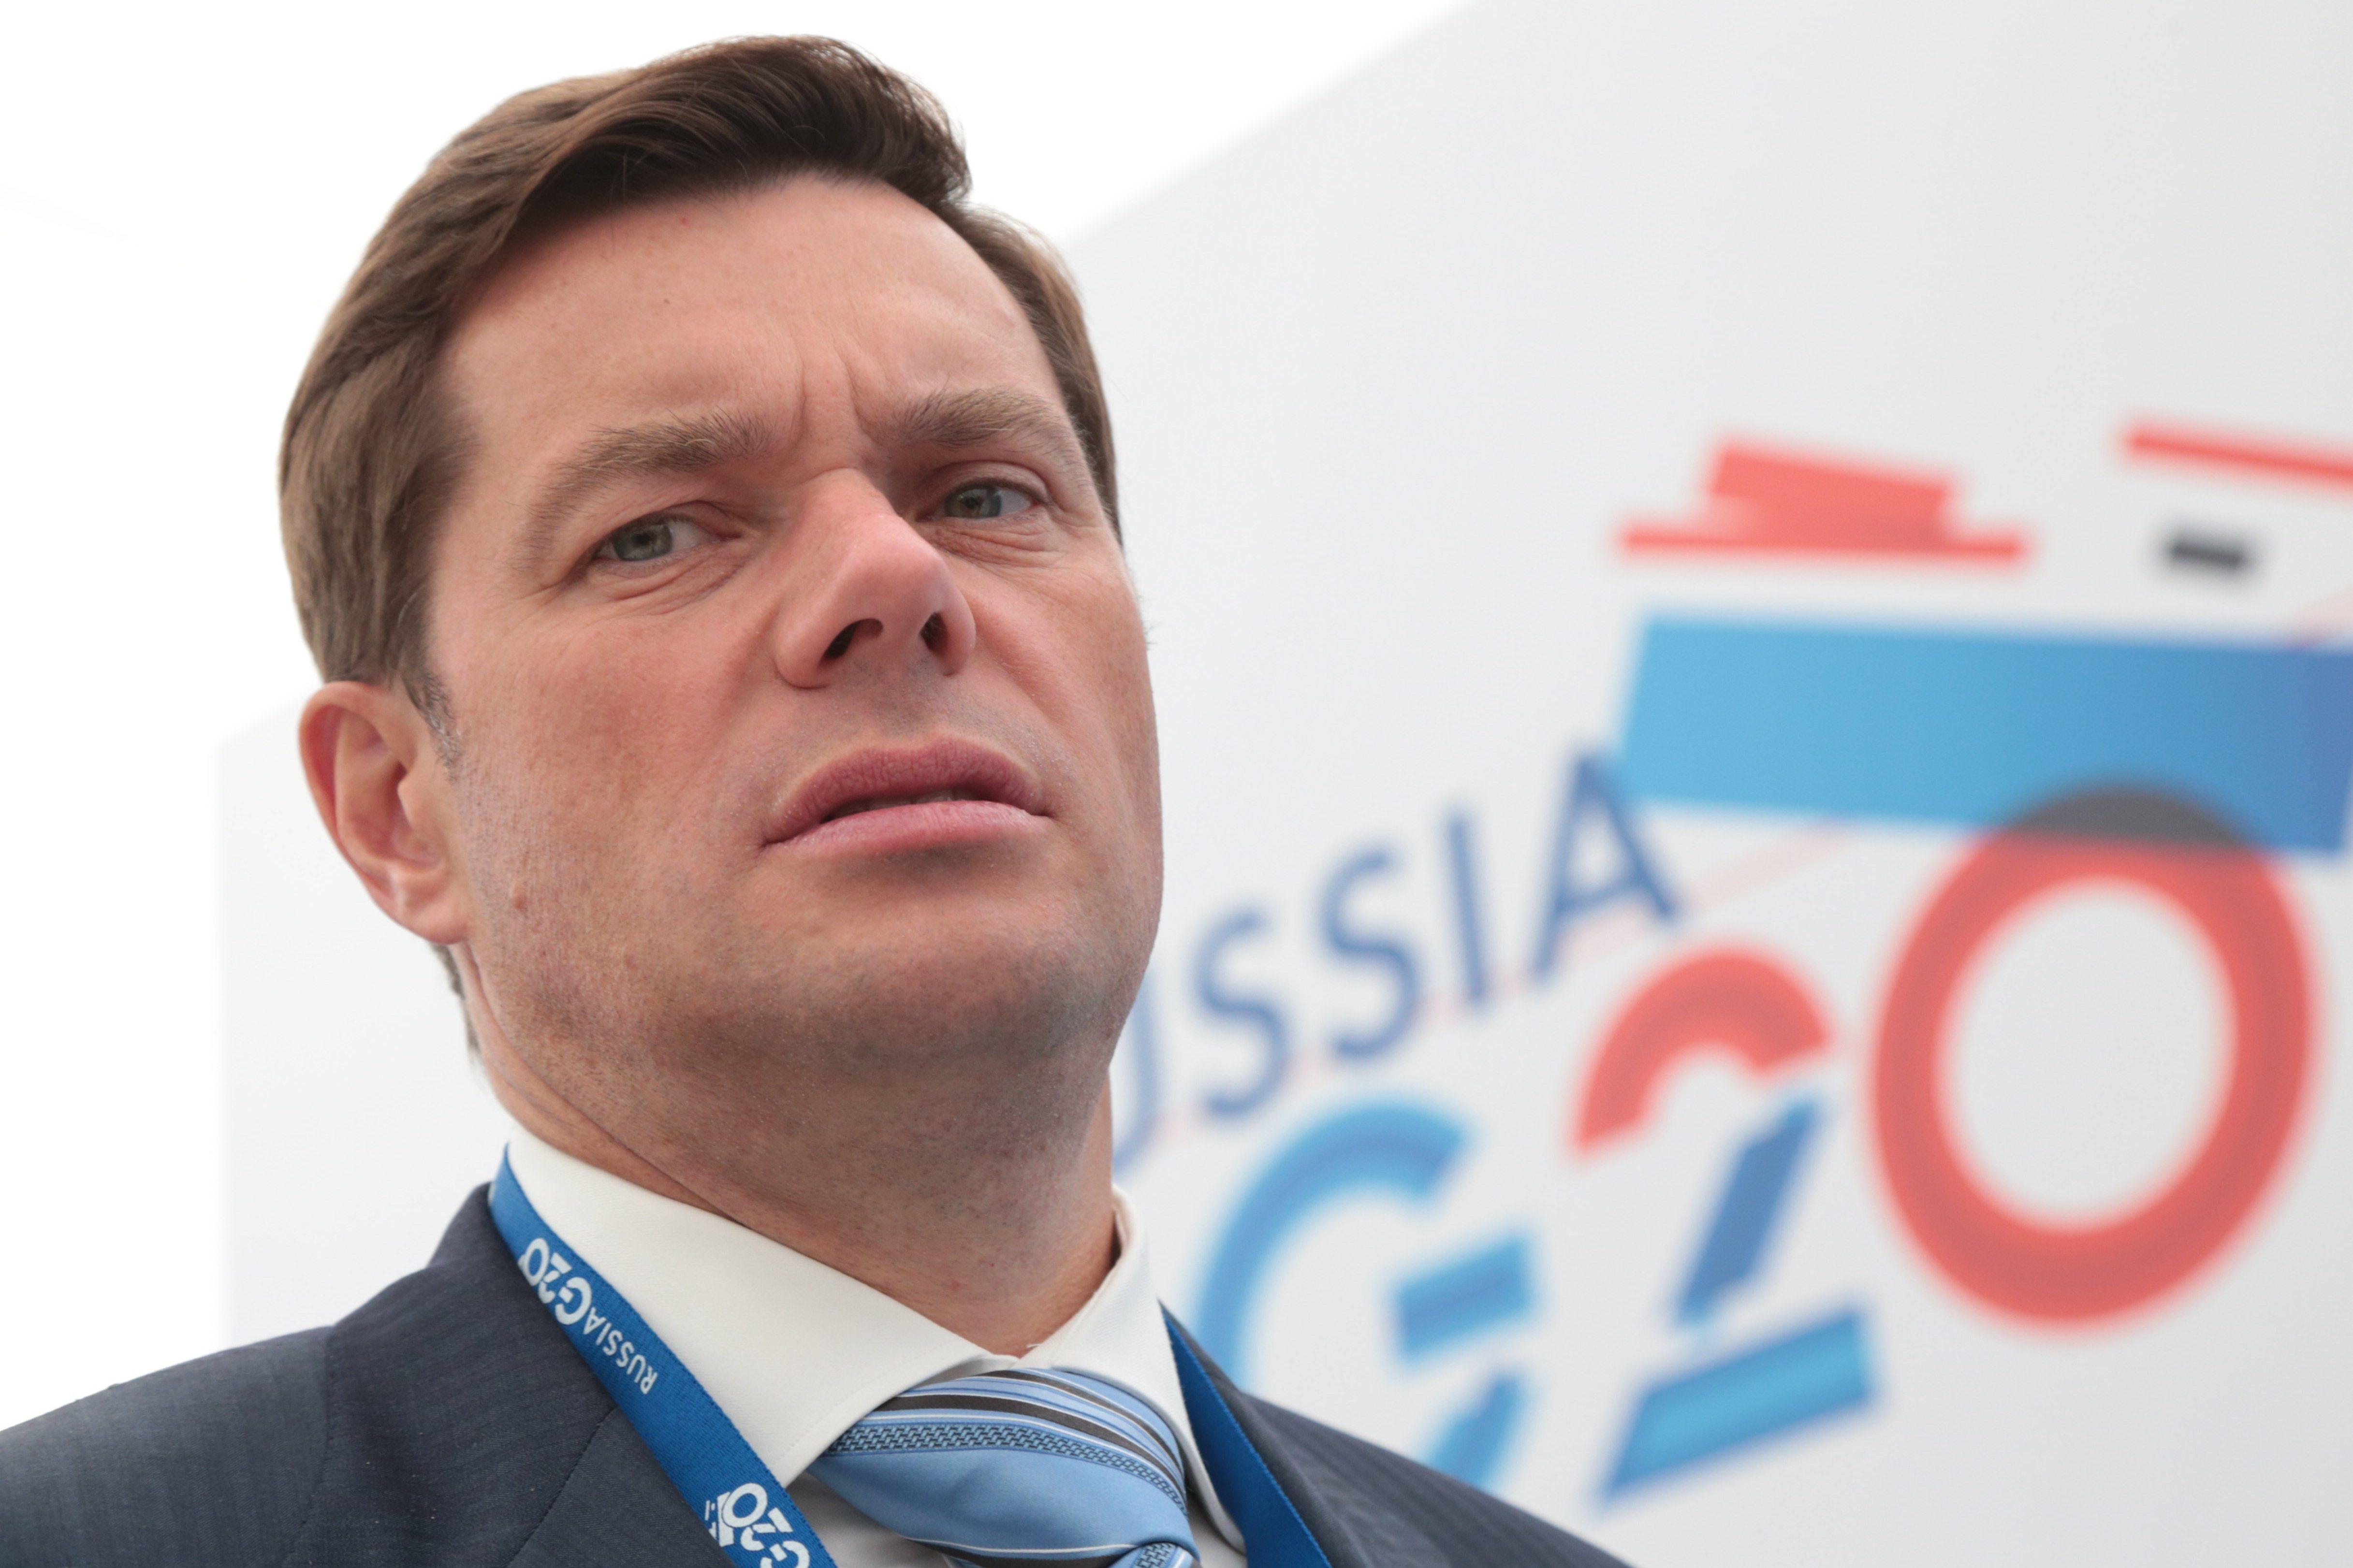 Череповецкий миллиардер Алексей Мордашов заявил о возможной волне банкротств у металлургов